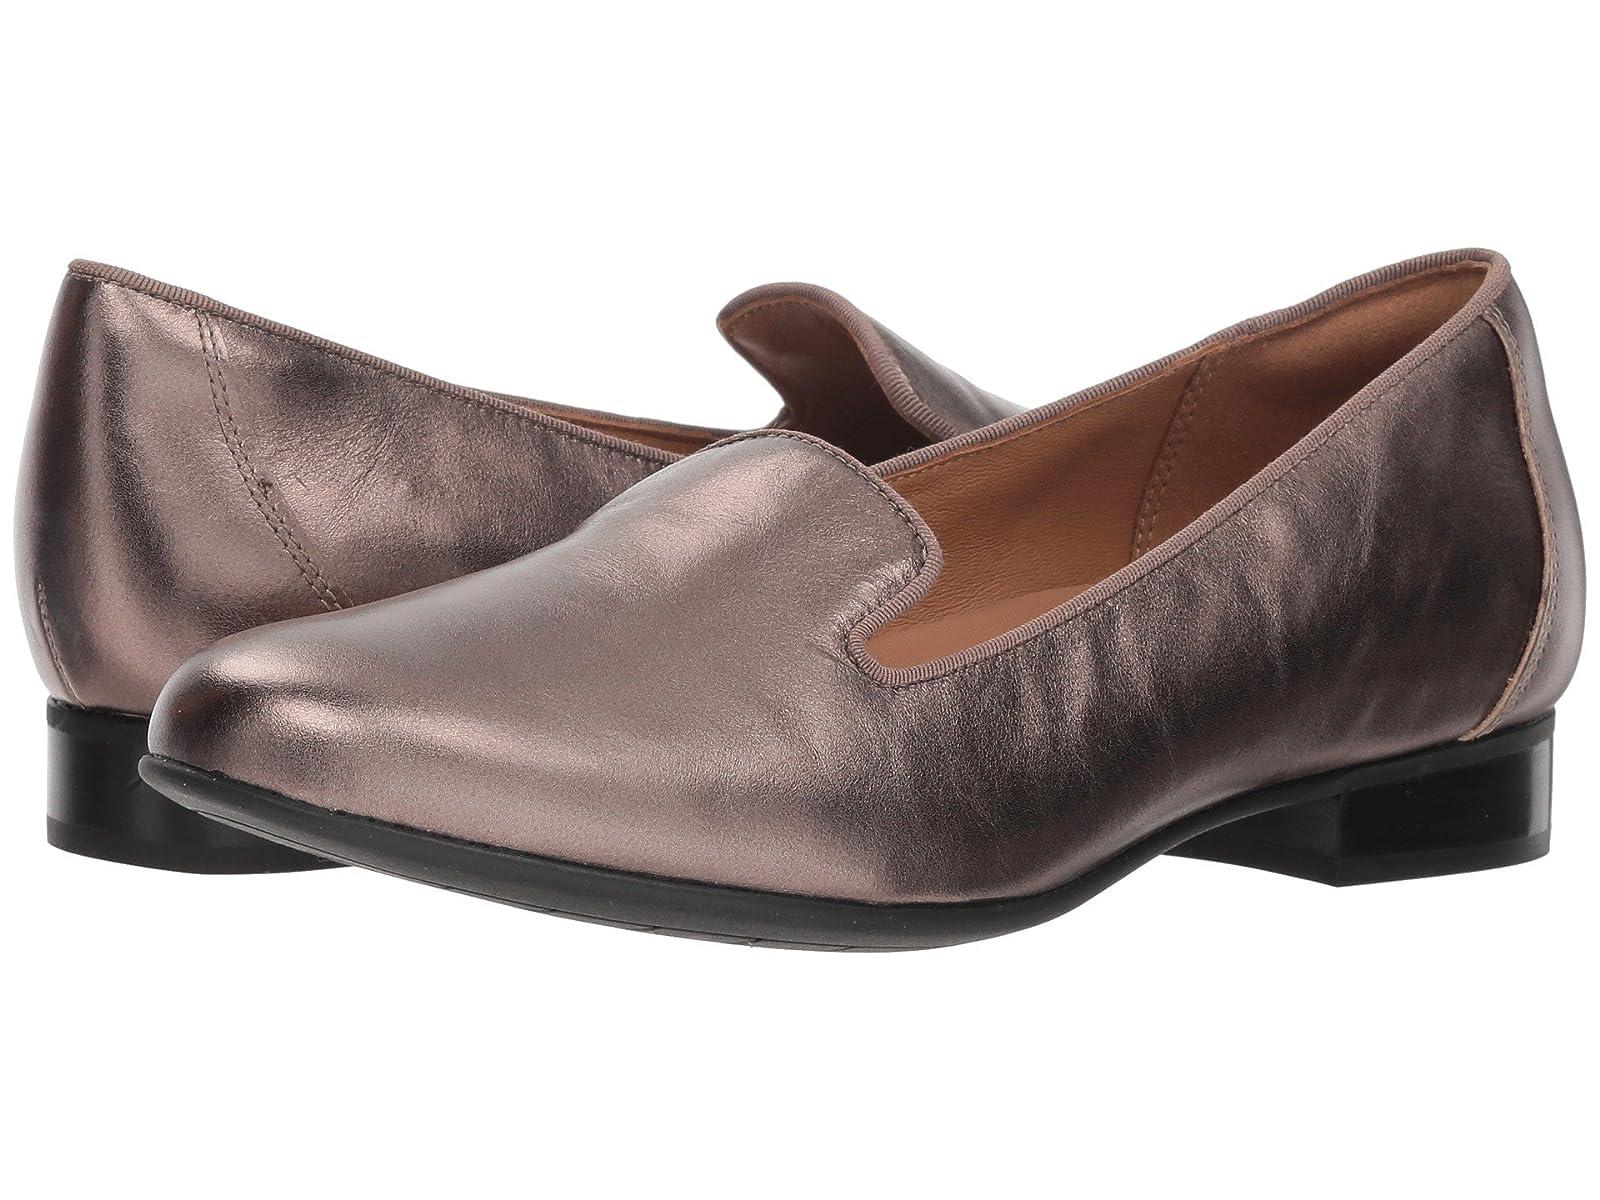 Clarks Un Blush StepAtmospheric grades have affordable shoes